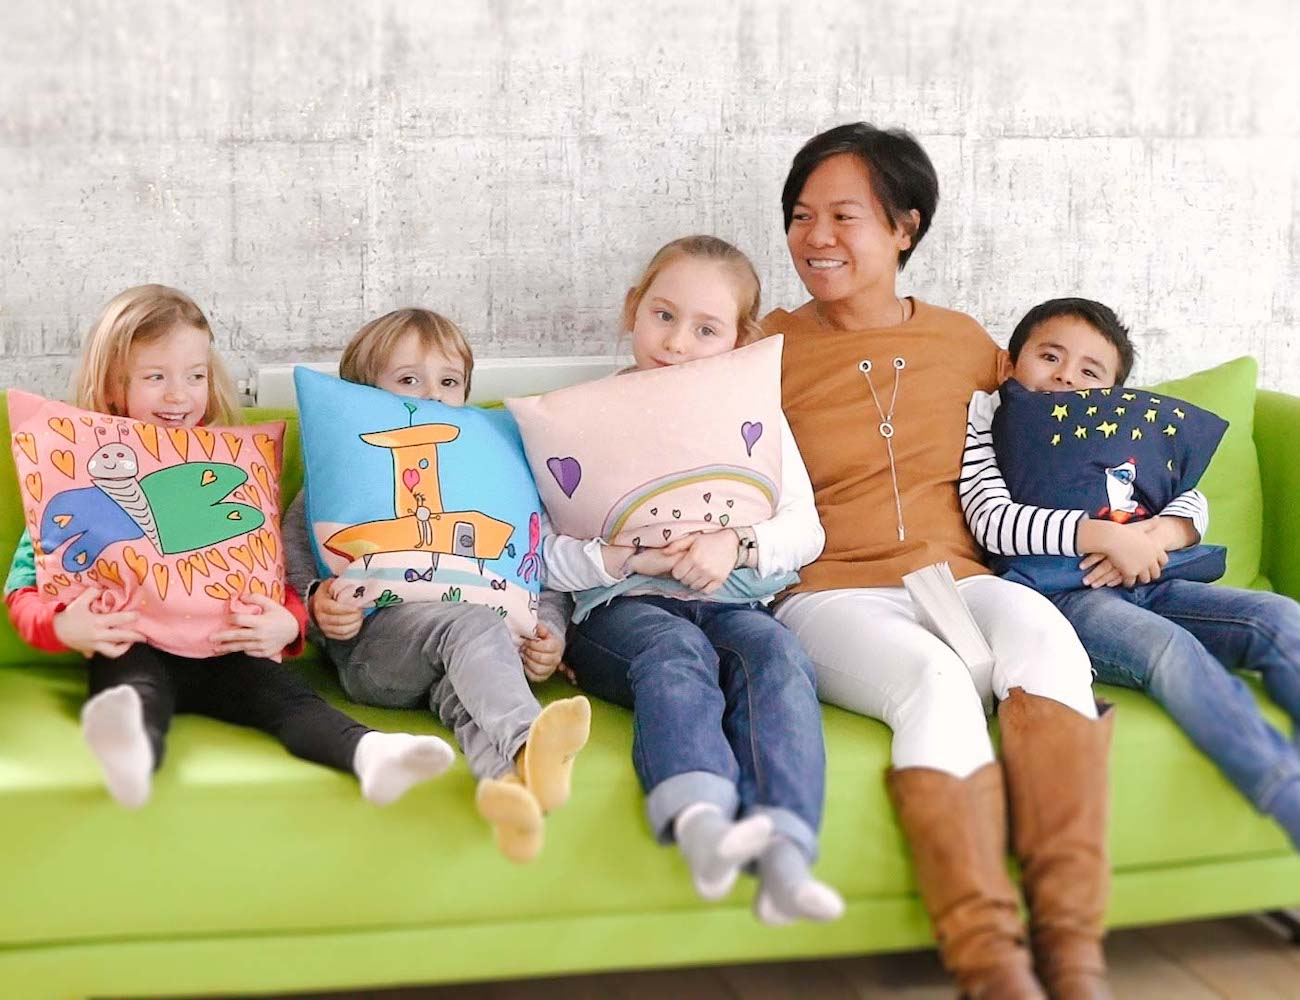 KiddyArts Handmade Customized Kids' Art Pillows make your child's art into a pillow